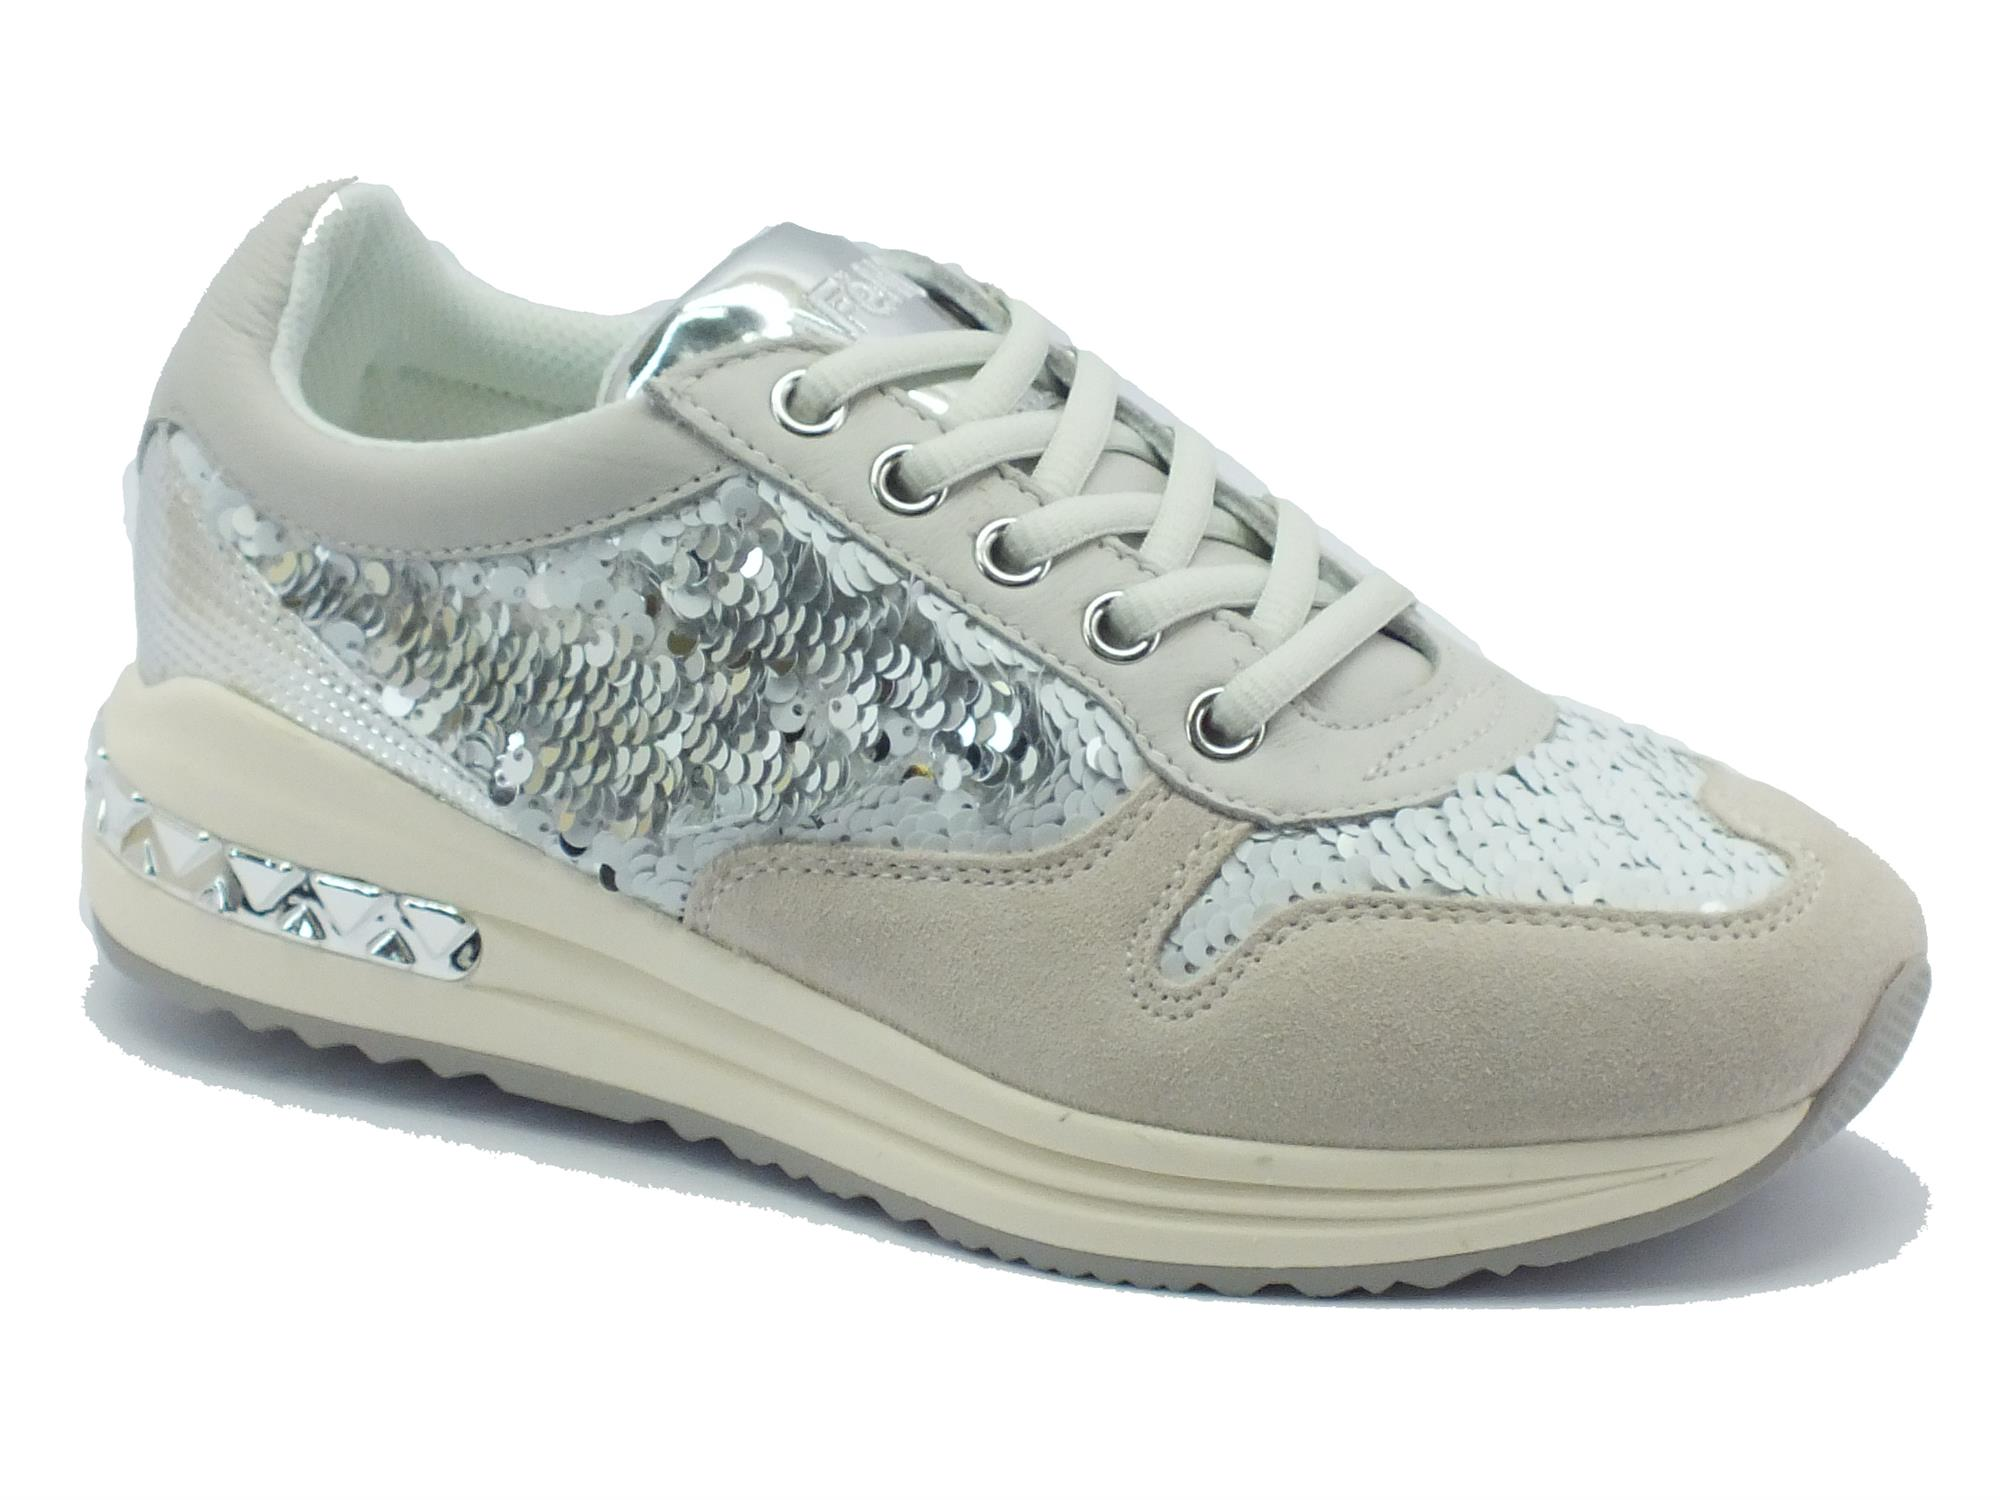 Sneakers CafèNoir donna camoscio beige paiettes - Vitiello Calzature 9b0c9f71c12